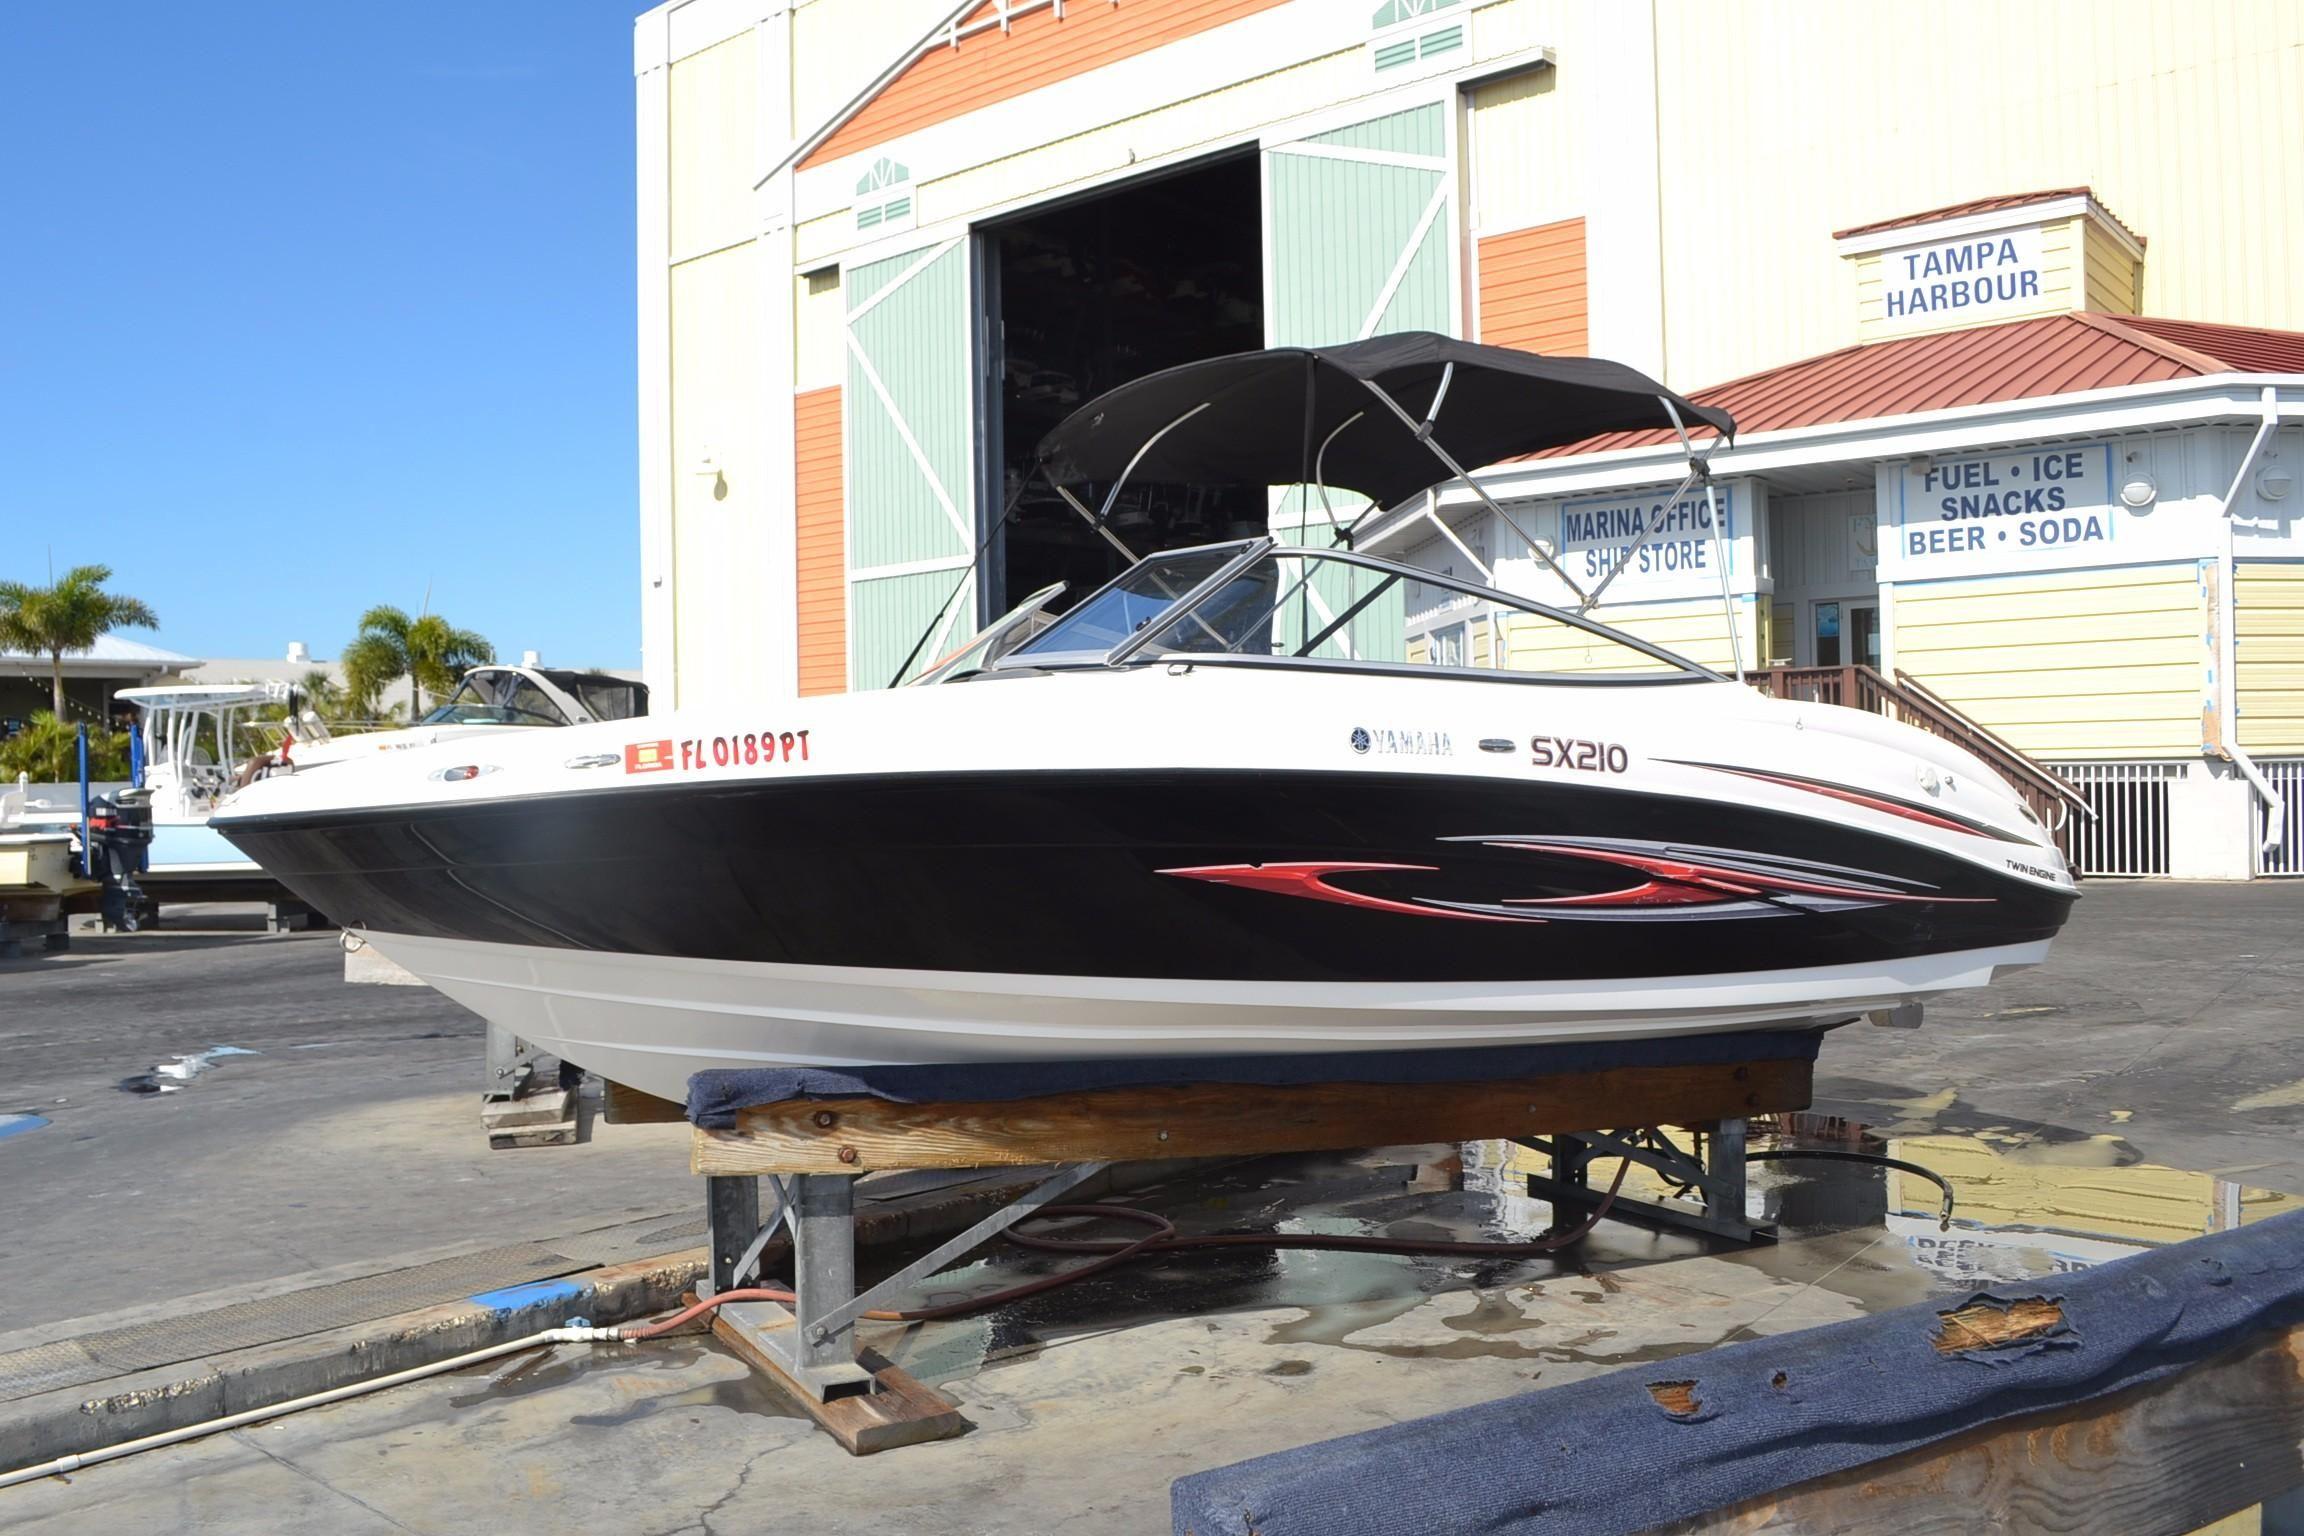 2008 yamaha sx210 power boat for sale for Yamaha dealer tampa